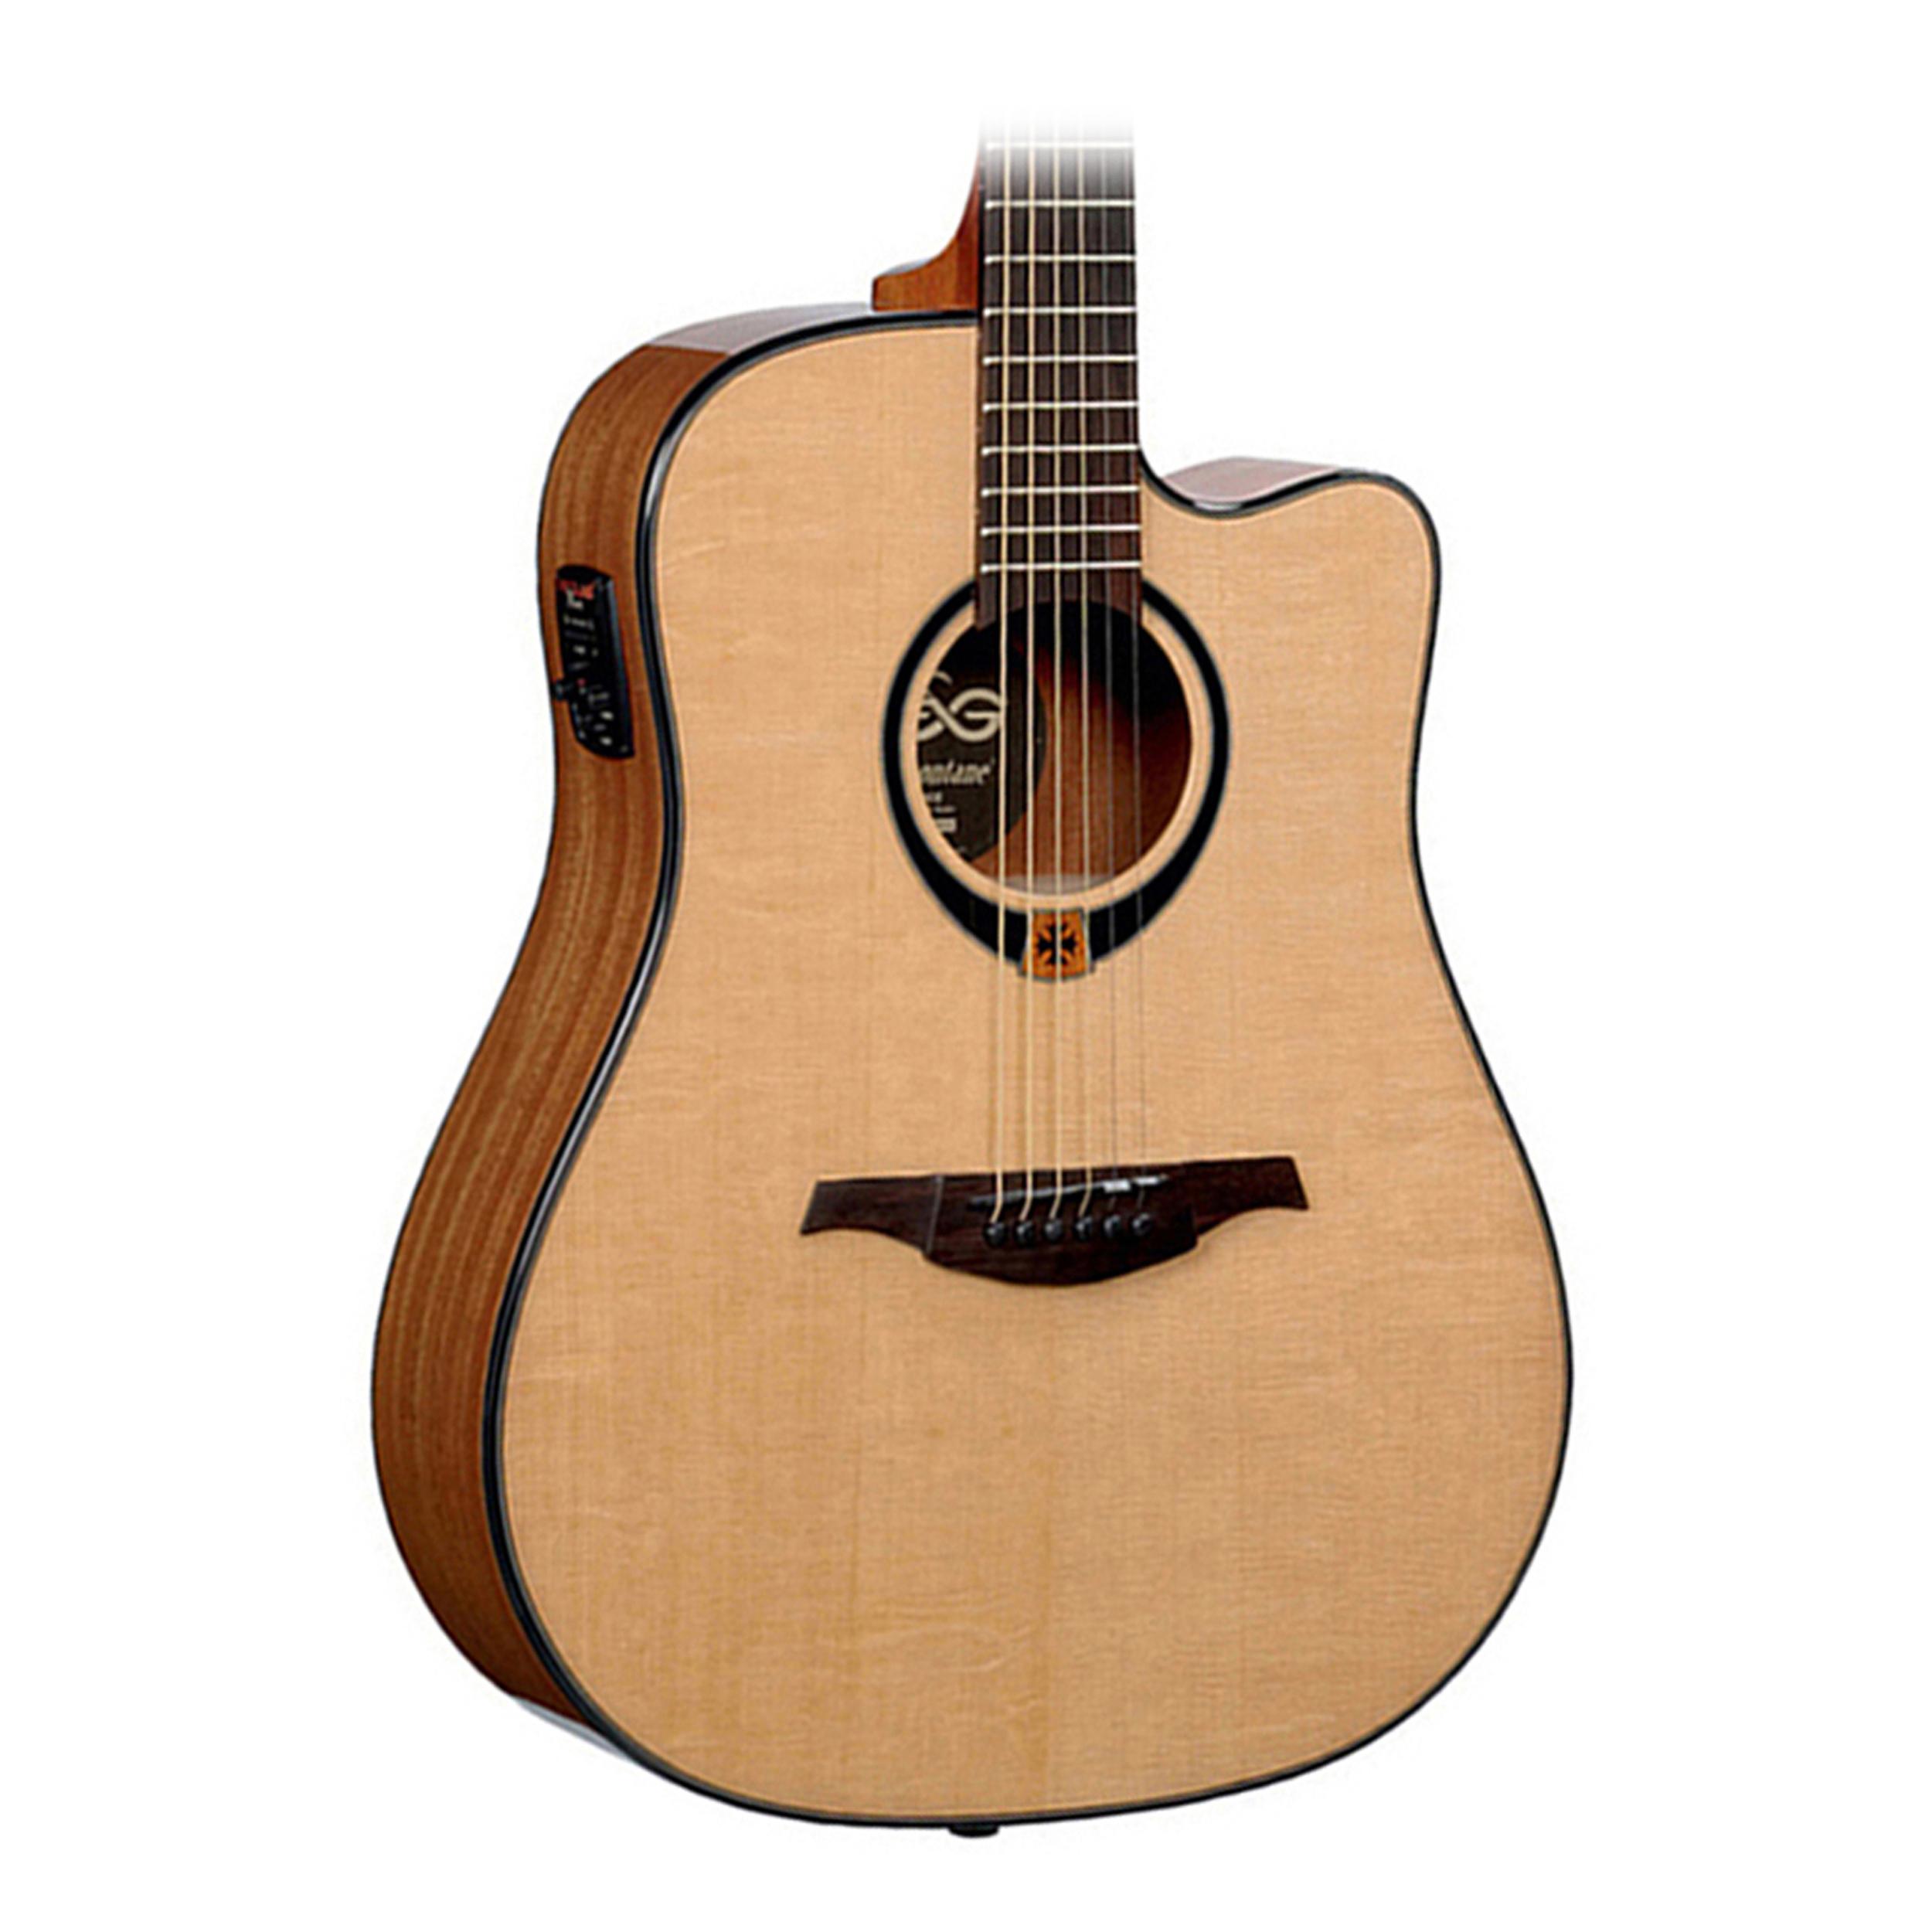 lag t80dce dreadnought acoustic electric guitar solid sp. Black Bedroom Furniture Sets. Home Design Ideas